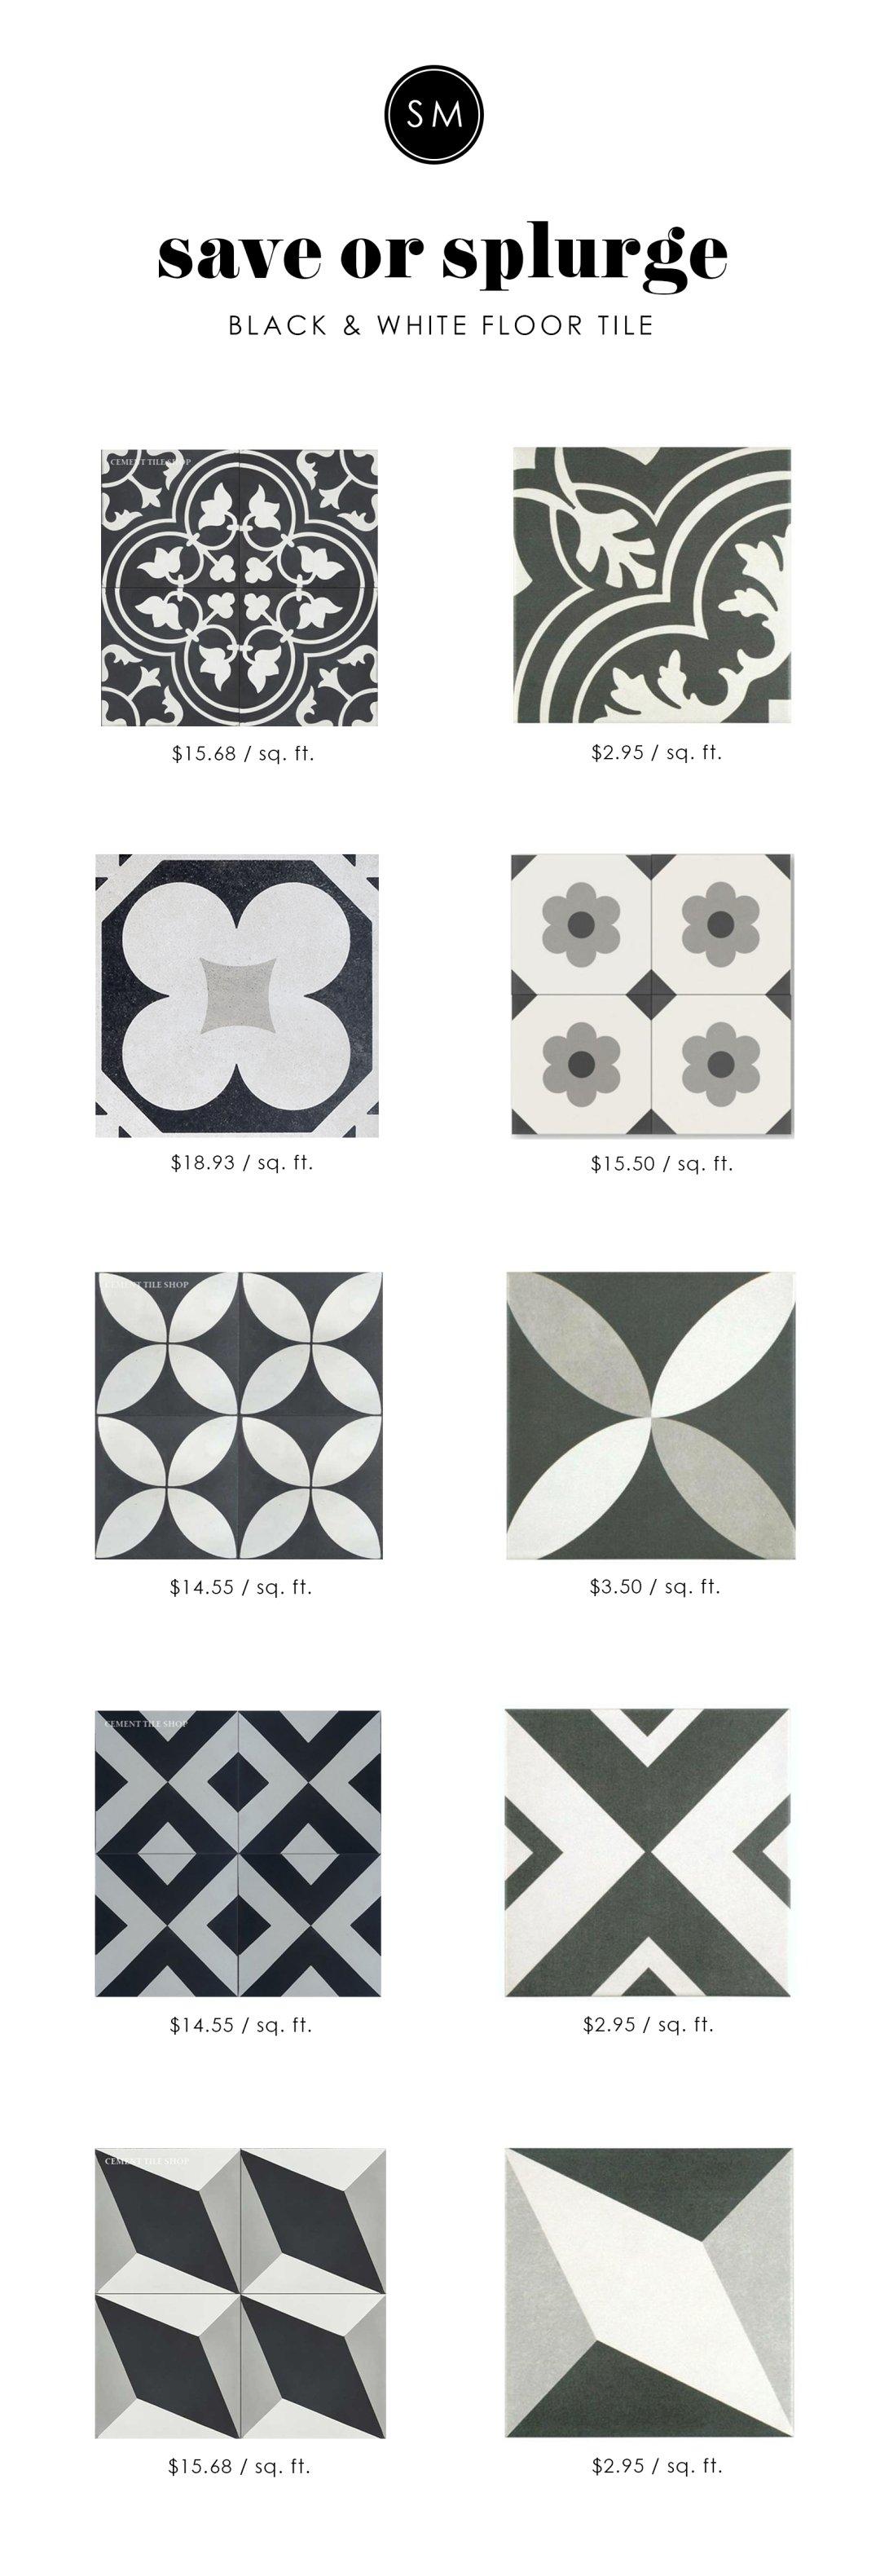 Save or splurge black white floor tile studio mcgee 1 of 10 dailygadgetfo Choice Image